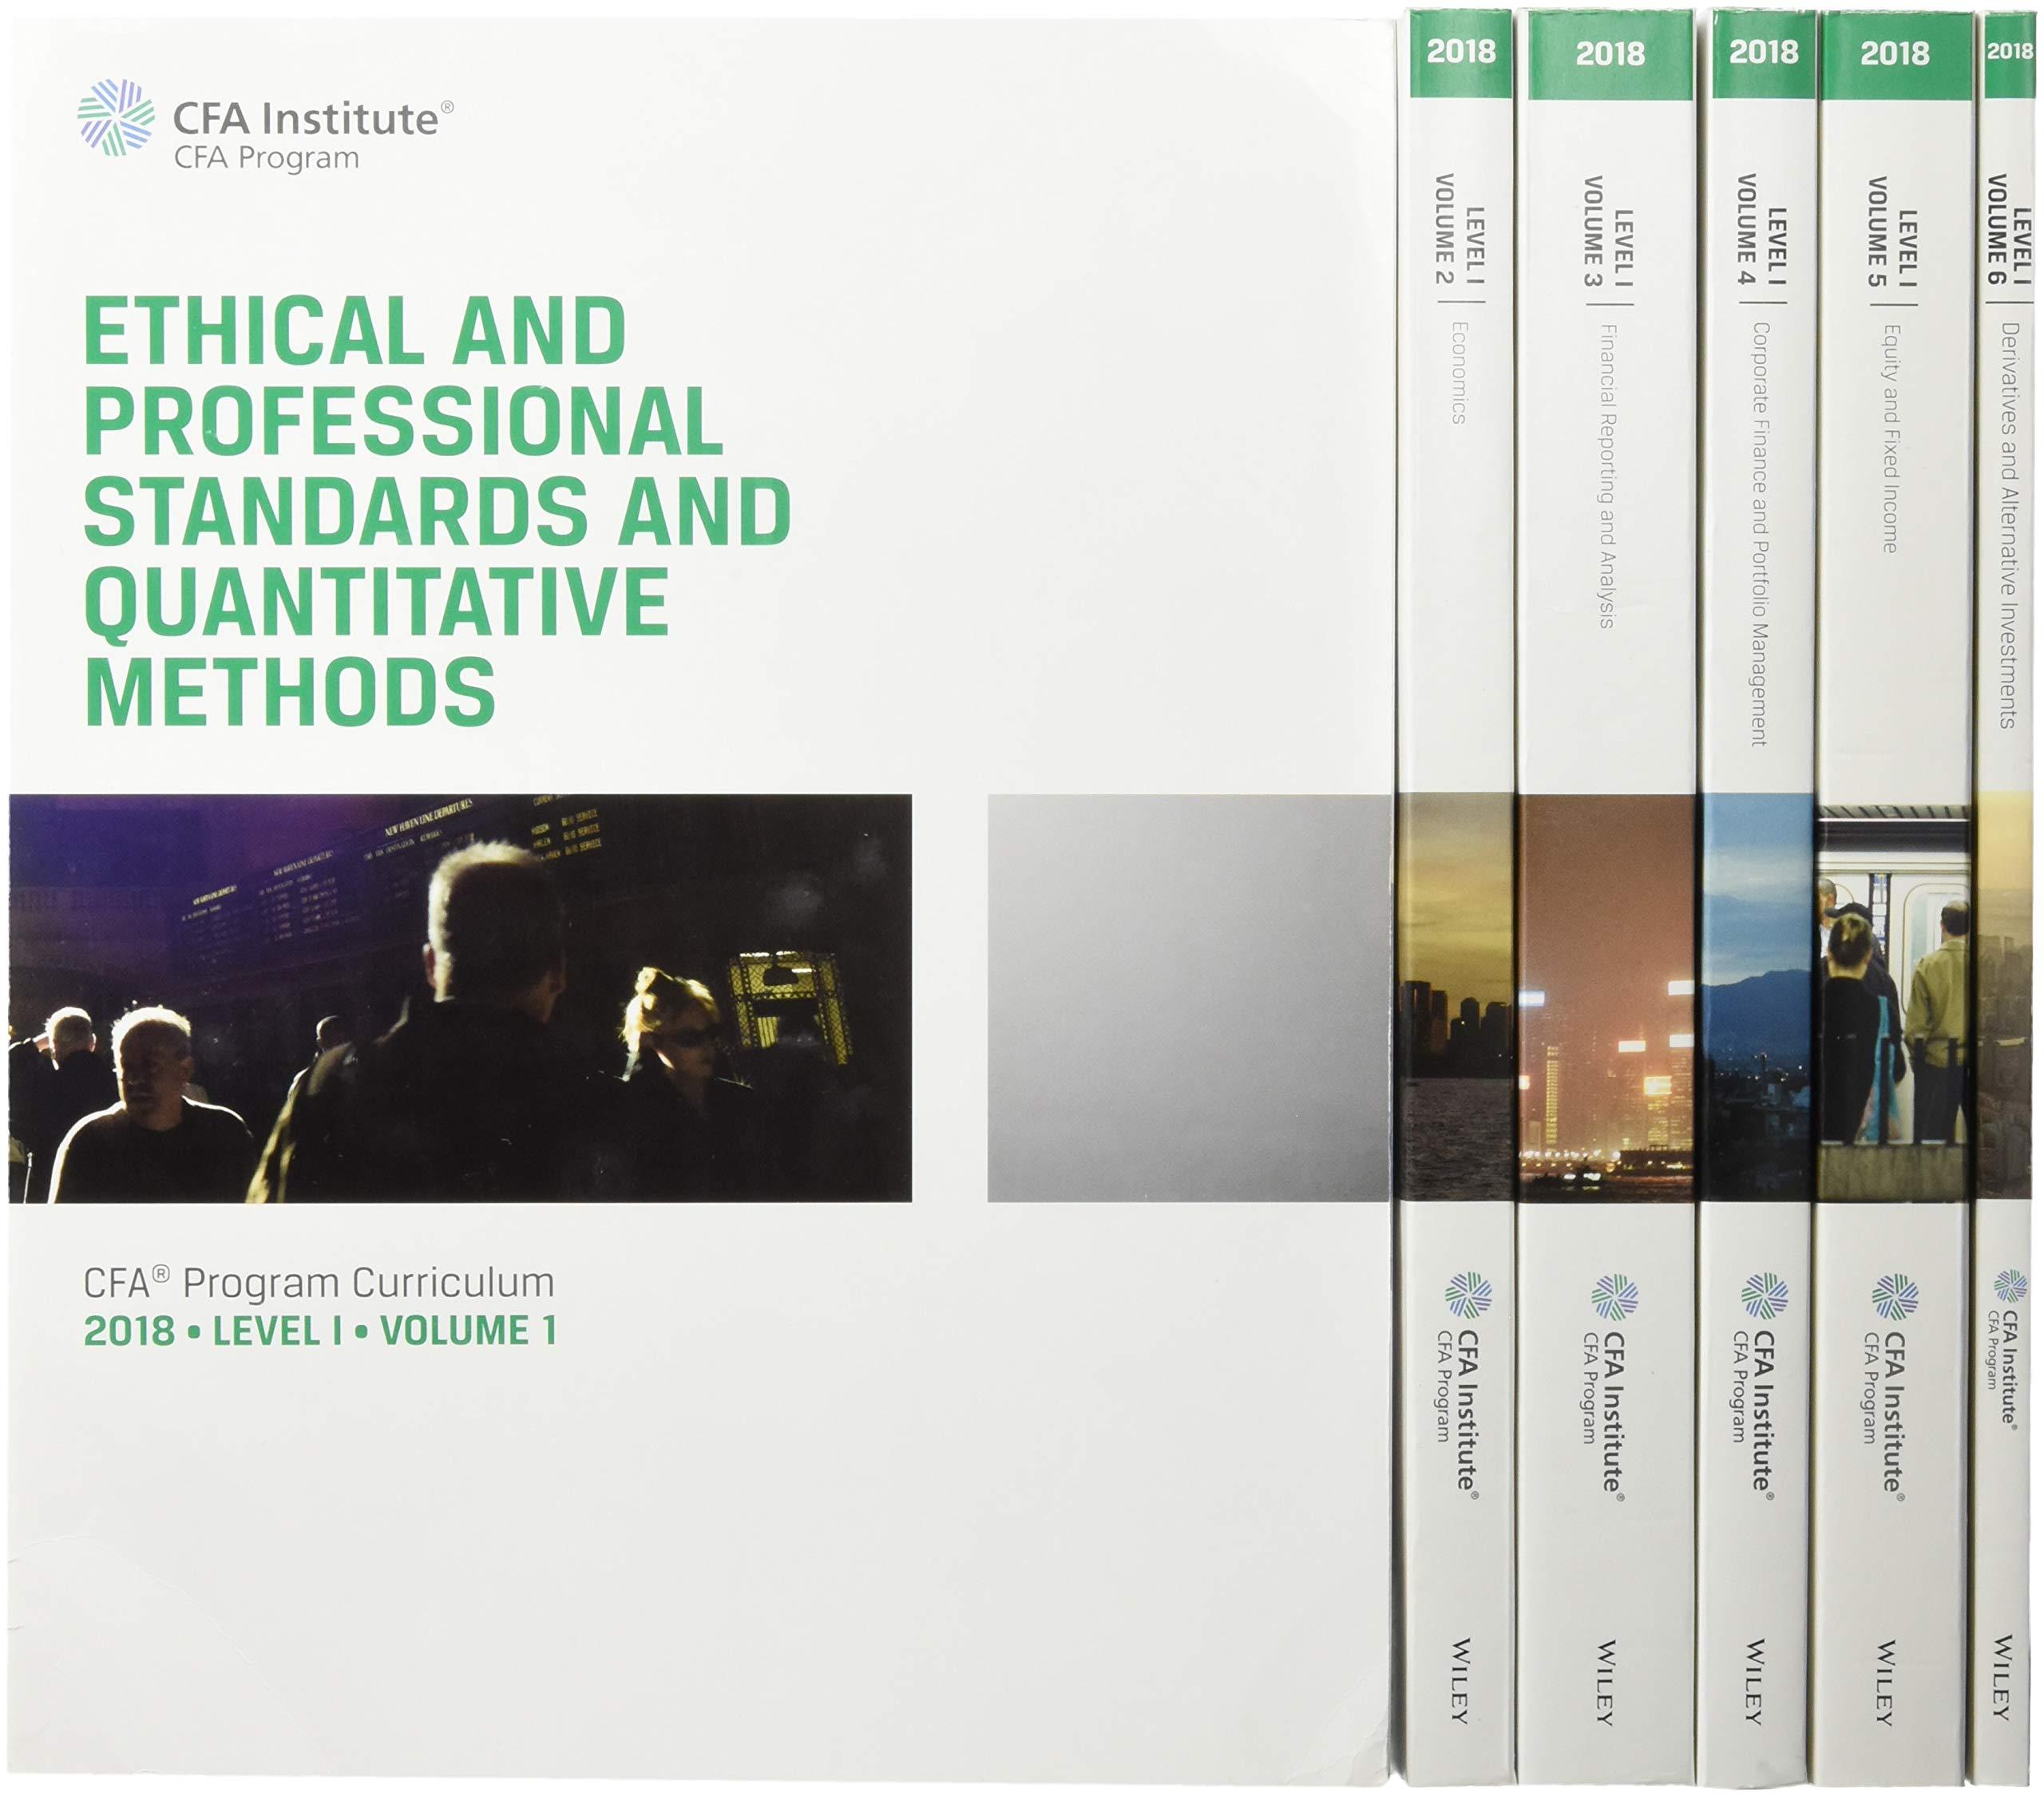 CFA Program Curriculum 2018 Level I: Volumes 1 - 6 Box Set CFA ...